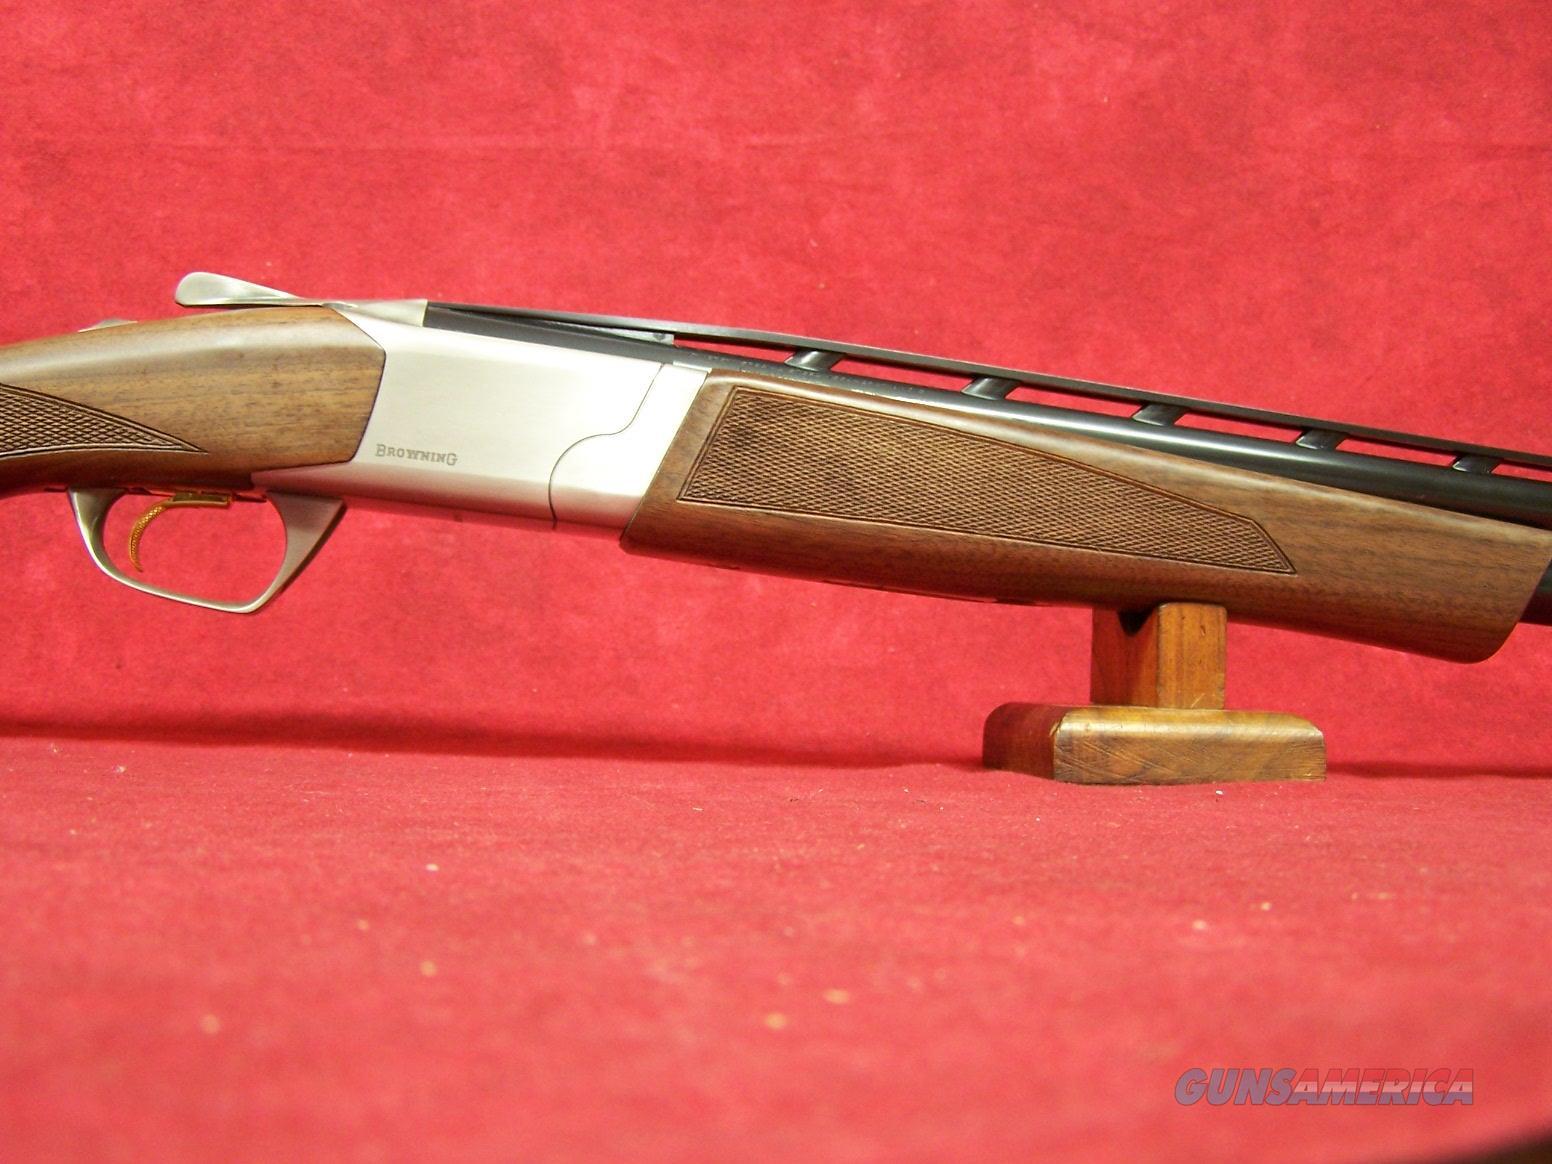 "Browning Cynergy CX 12ga 28"" Barrel 3"" (018709304)  Guns > Shotguns > Browning Shotguns > Over Unders > Cynergy > Hunting"